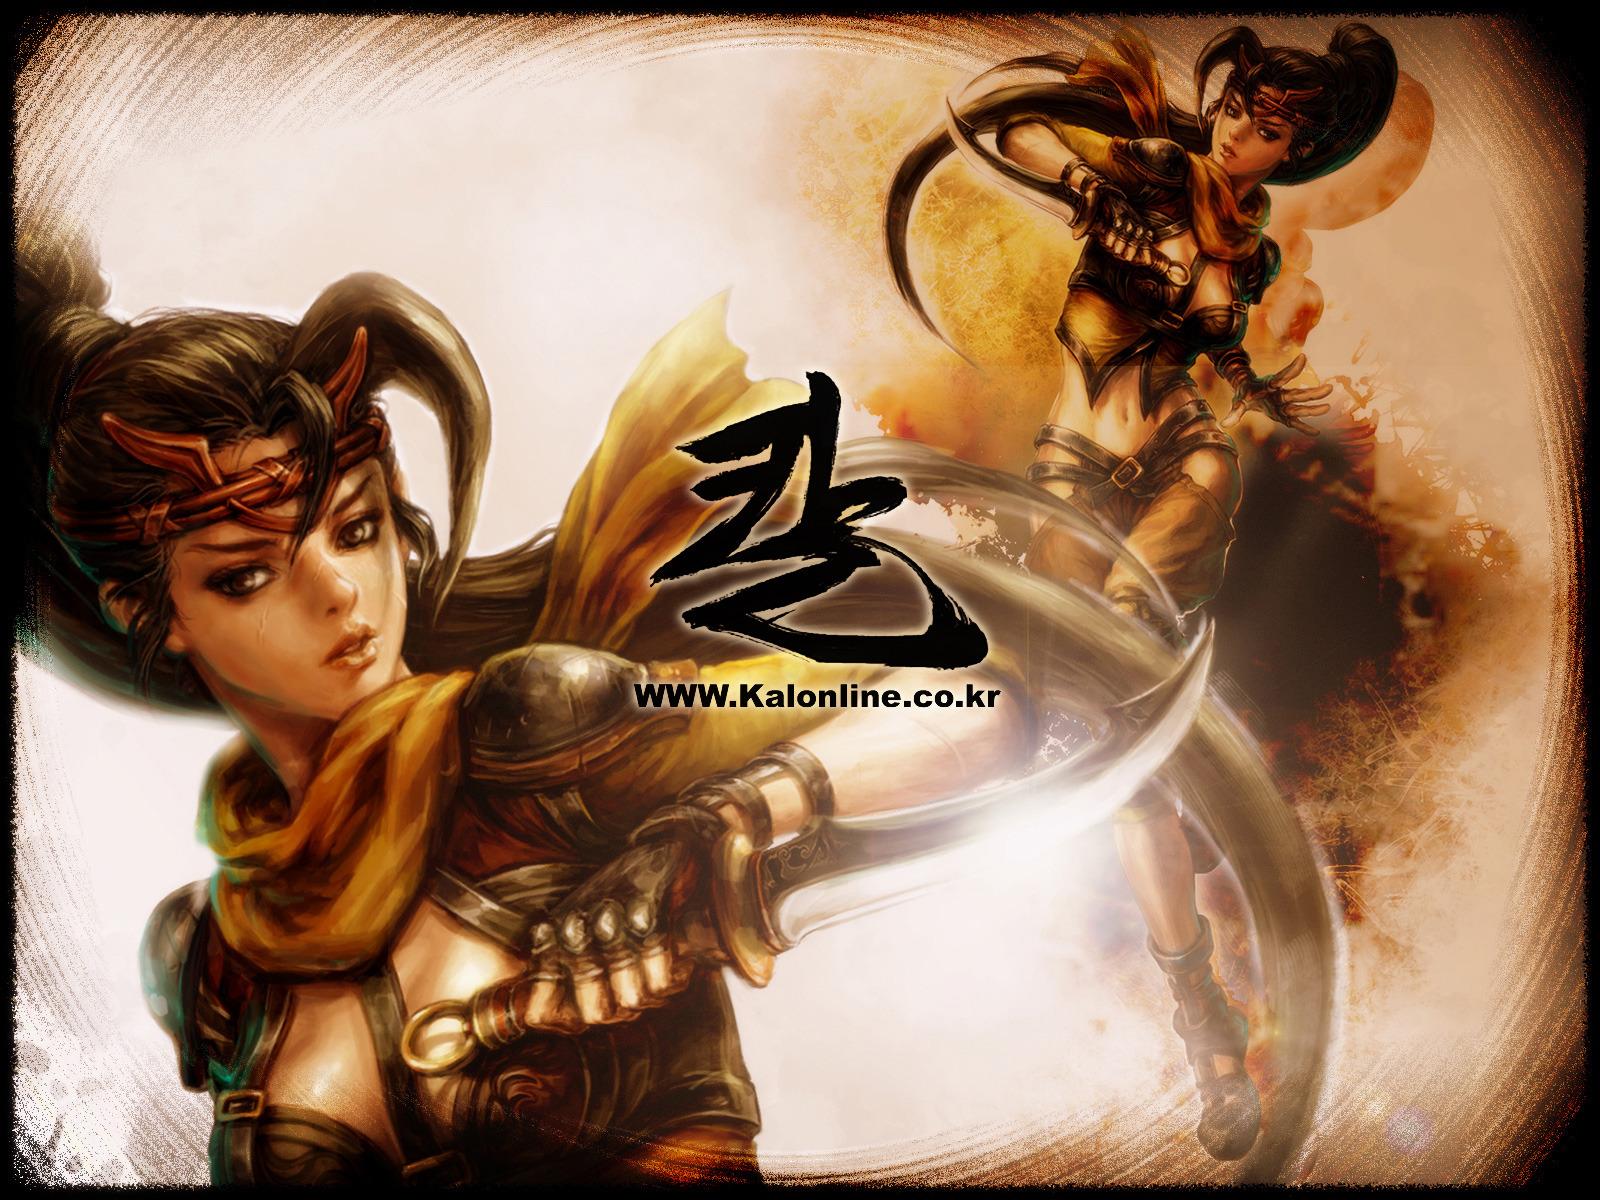 Kal Online wallpaper